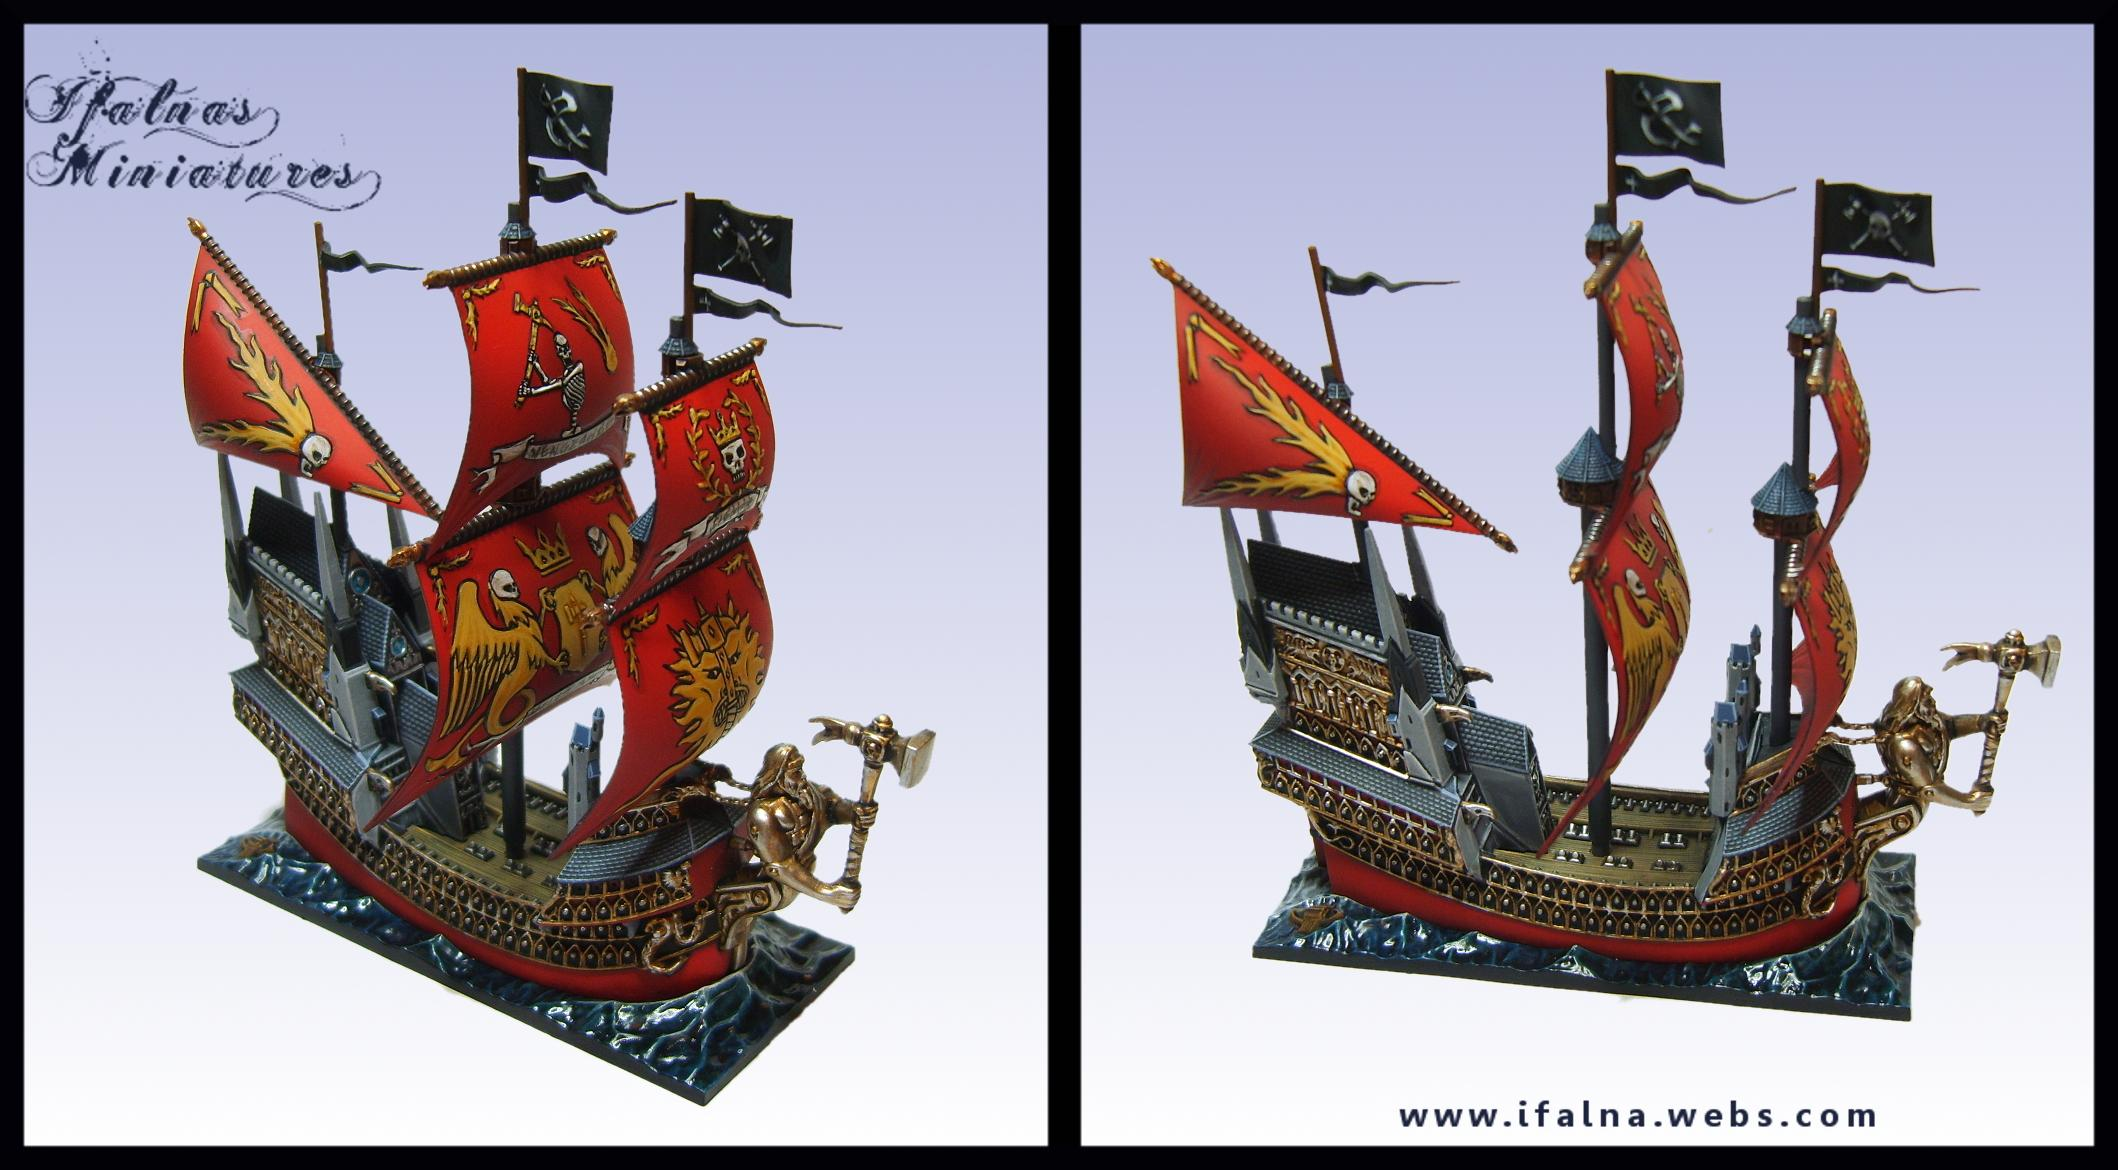 Boat, Dreadfleet, Flag, Games Workshop, Gold, Heldenhammer, Red, Sail, Sea, Ship, Water